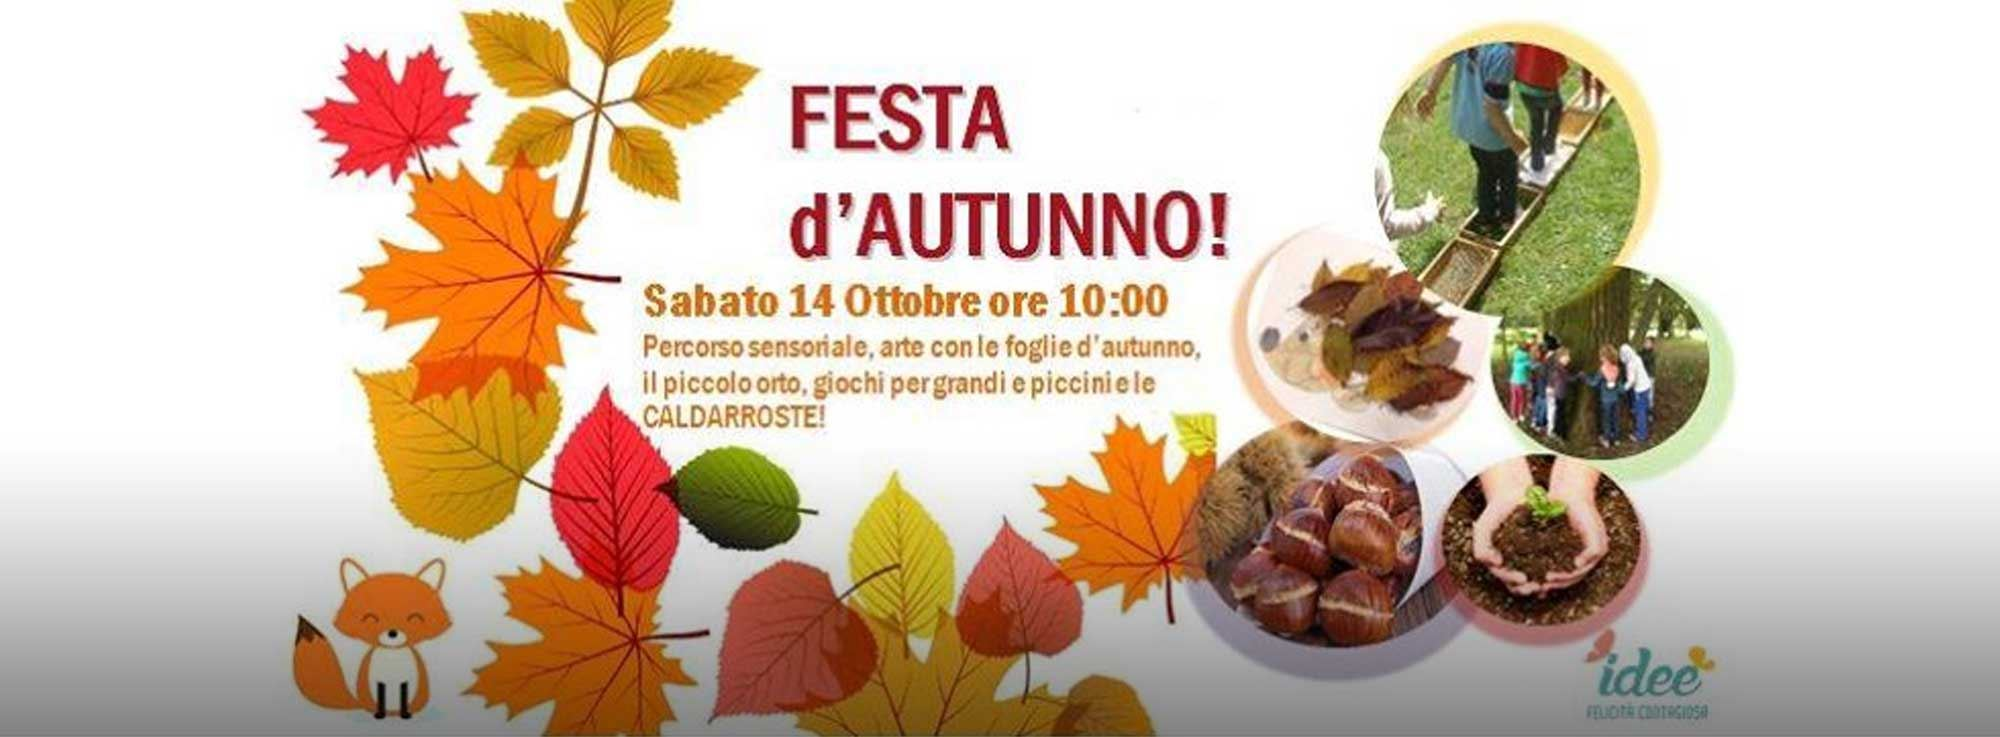 Torre a Mare: Festa d'autunno